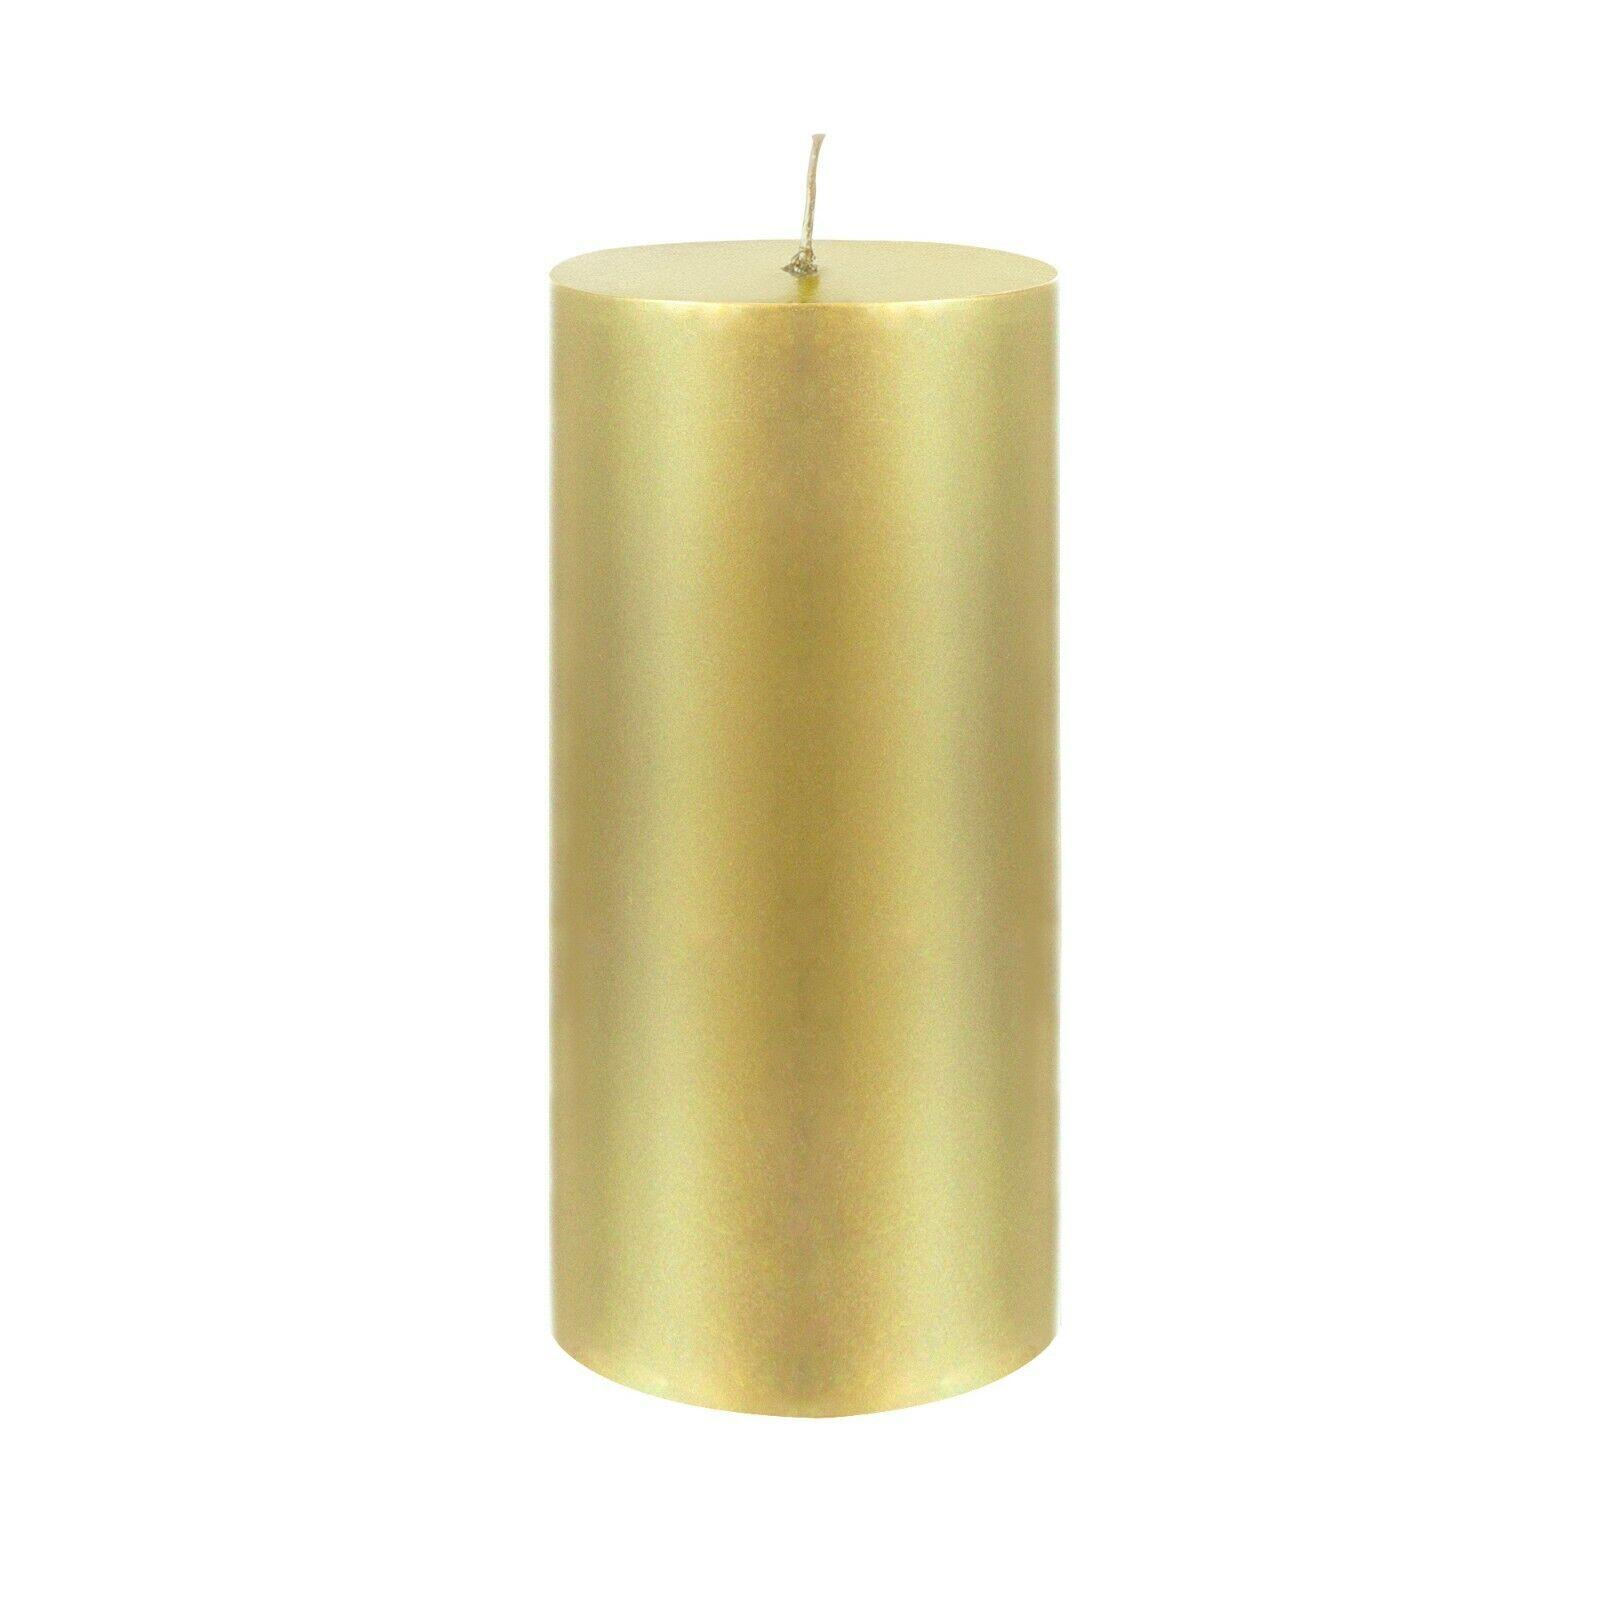 Mega Candles - Unscented 3 x 6  Hand Poured RND Premium Pillar Candle gold 6PCS